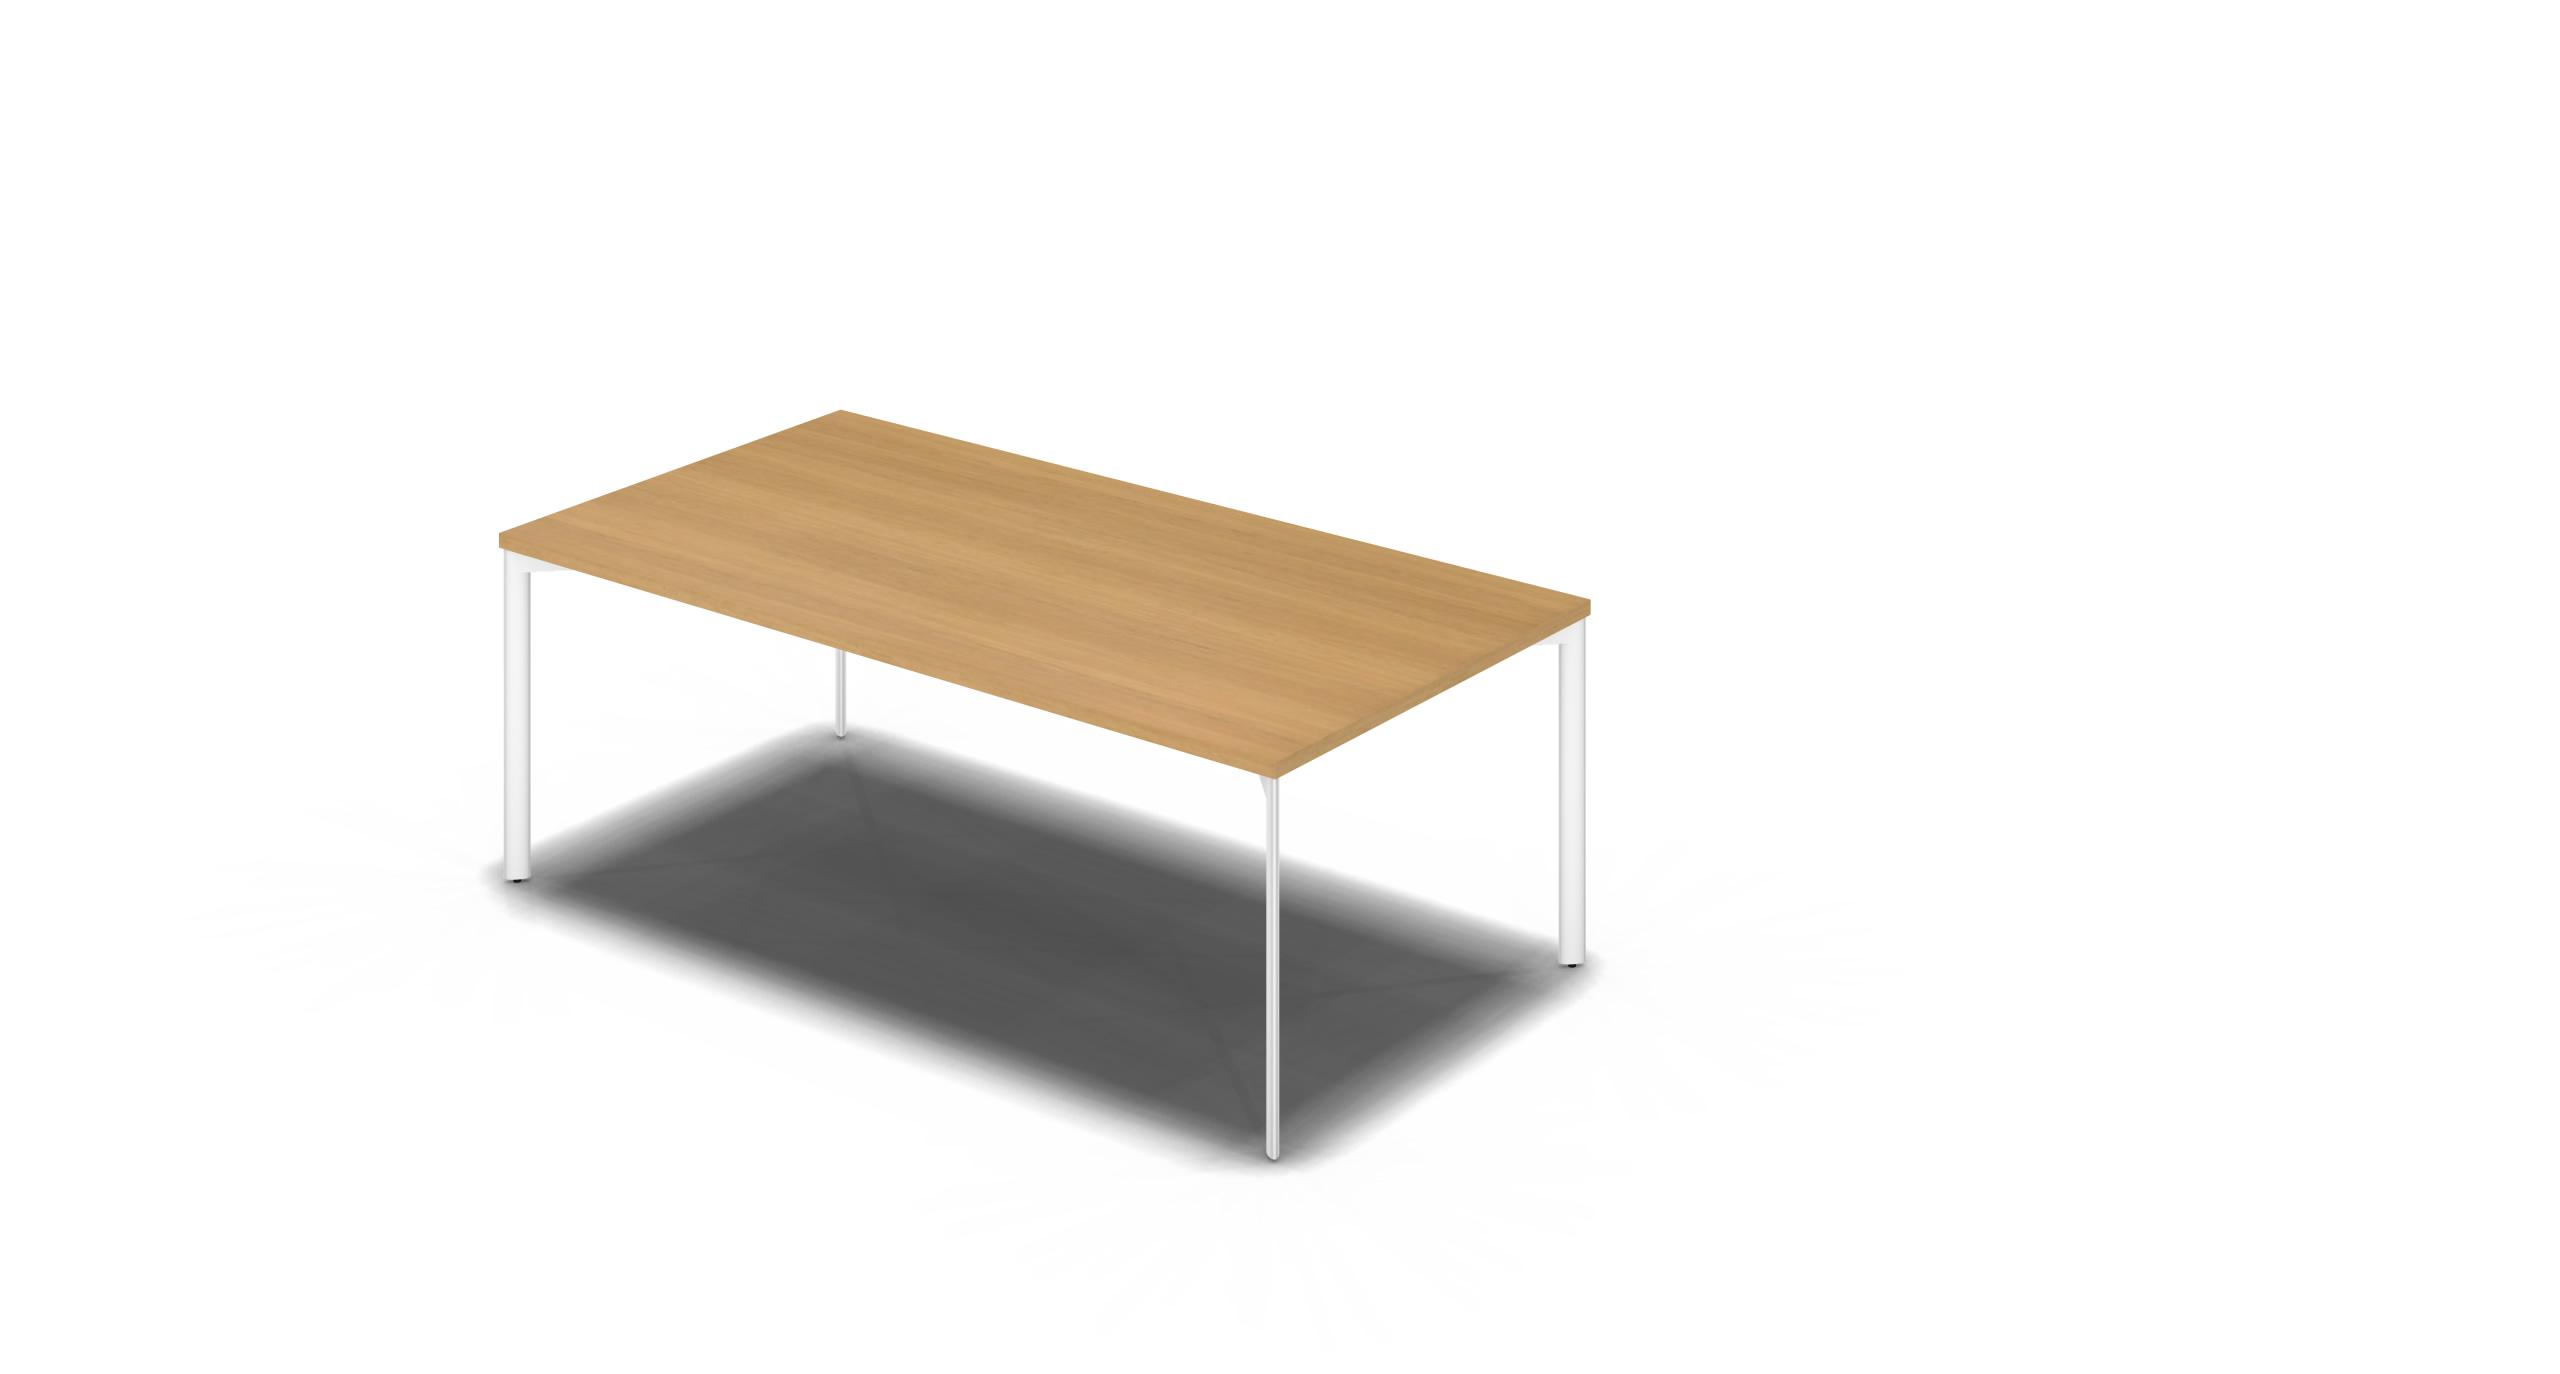 Table_Slim_1800x900_White_Oak_noOption